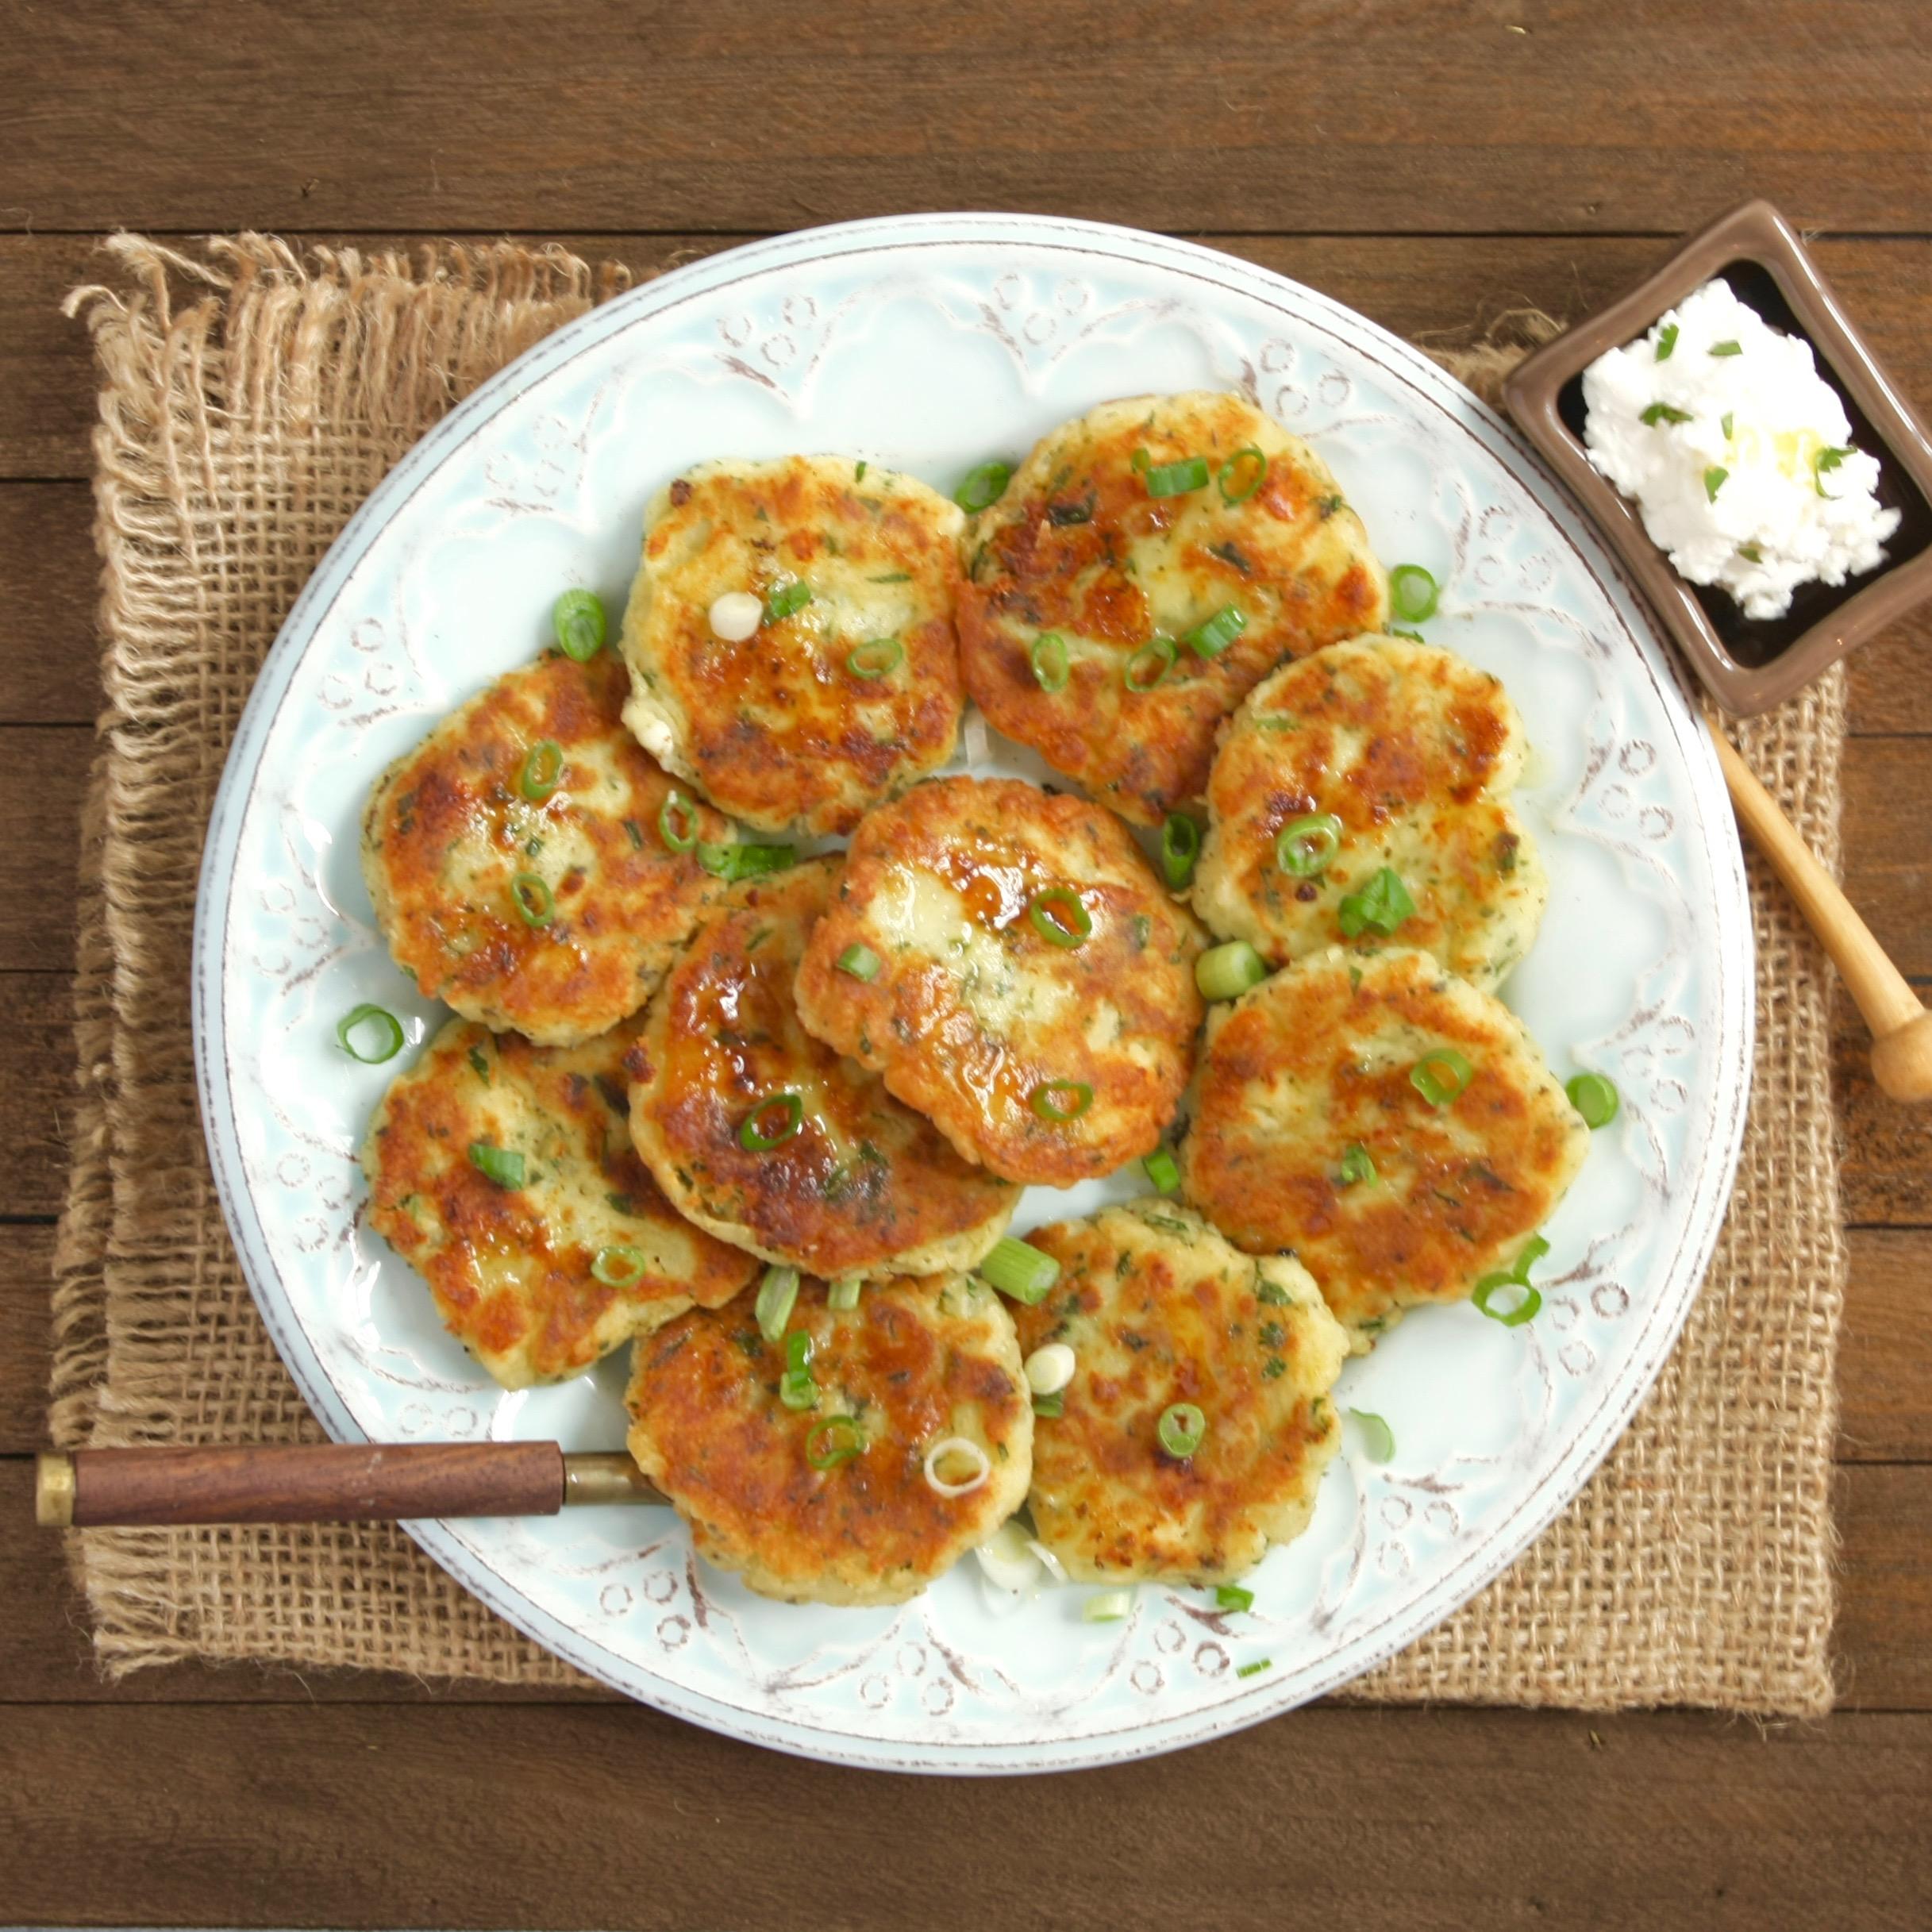 Easy Greek Potato Patties With Creamy Feta Cheese Sauce Marilena S Kitchen